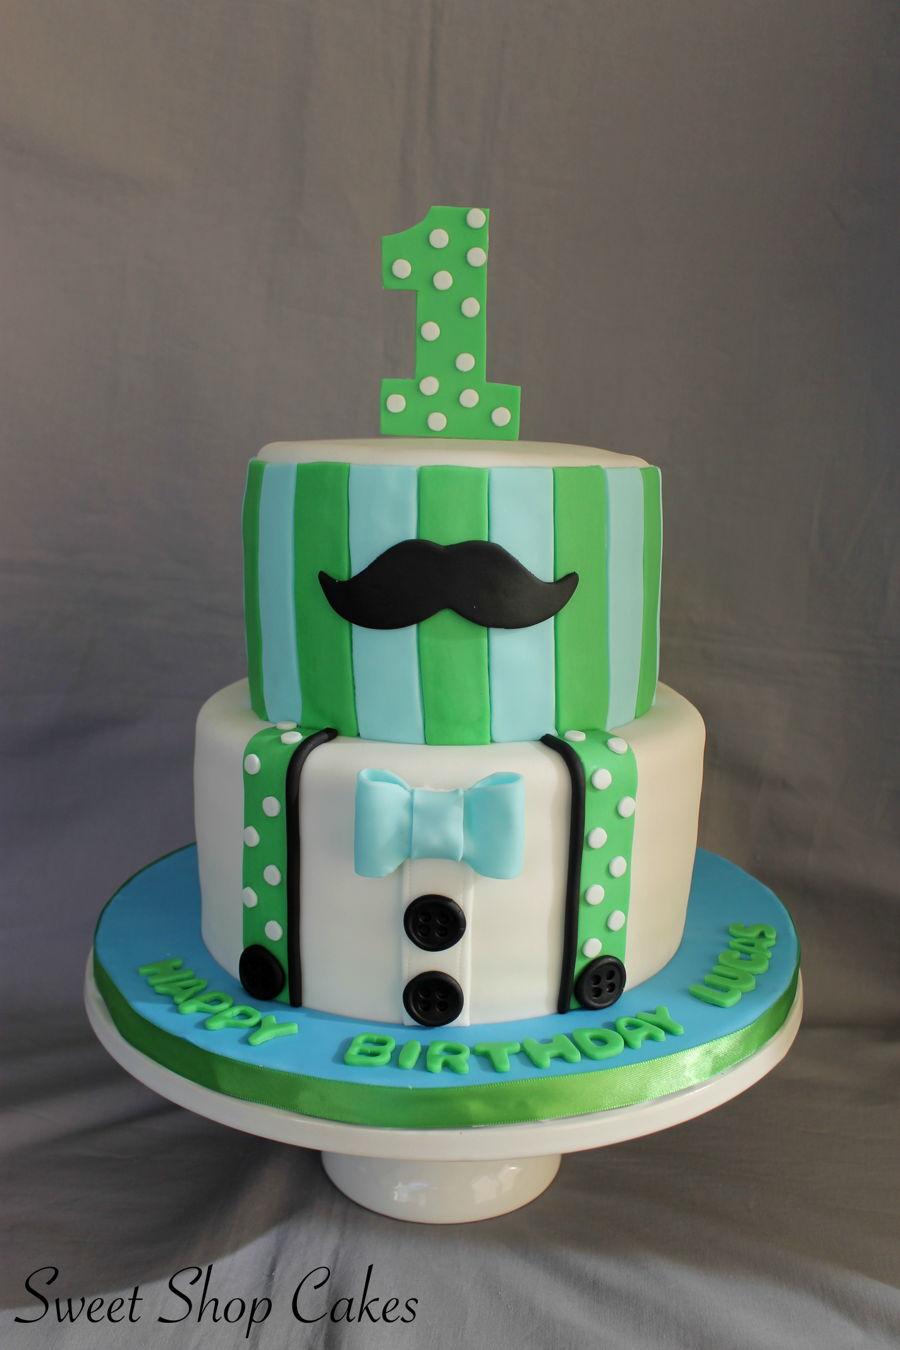 Little Man Themed Cake on Cake Central